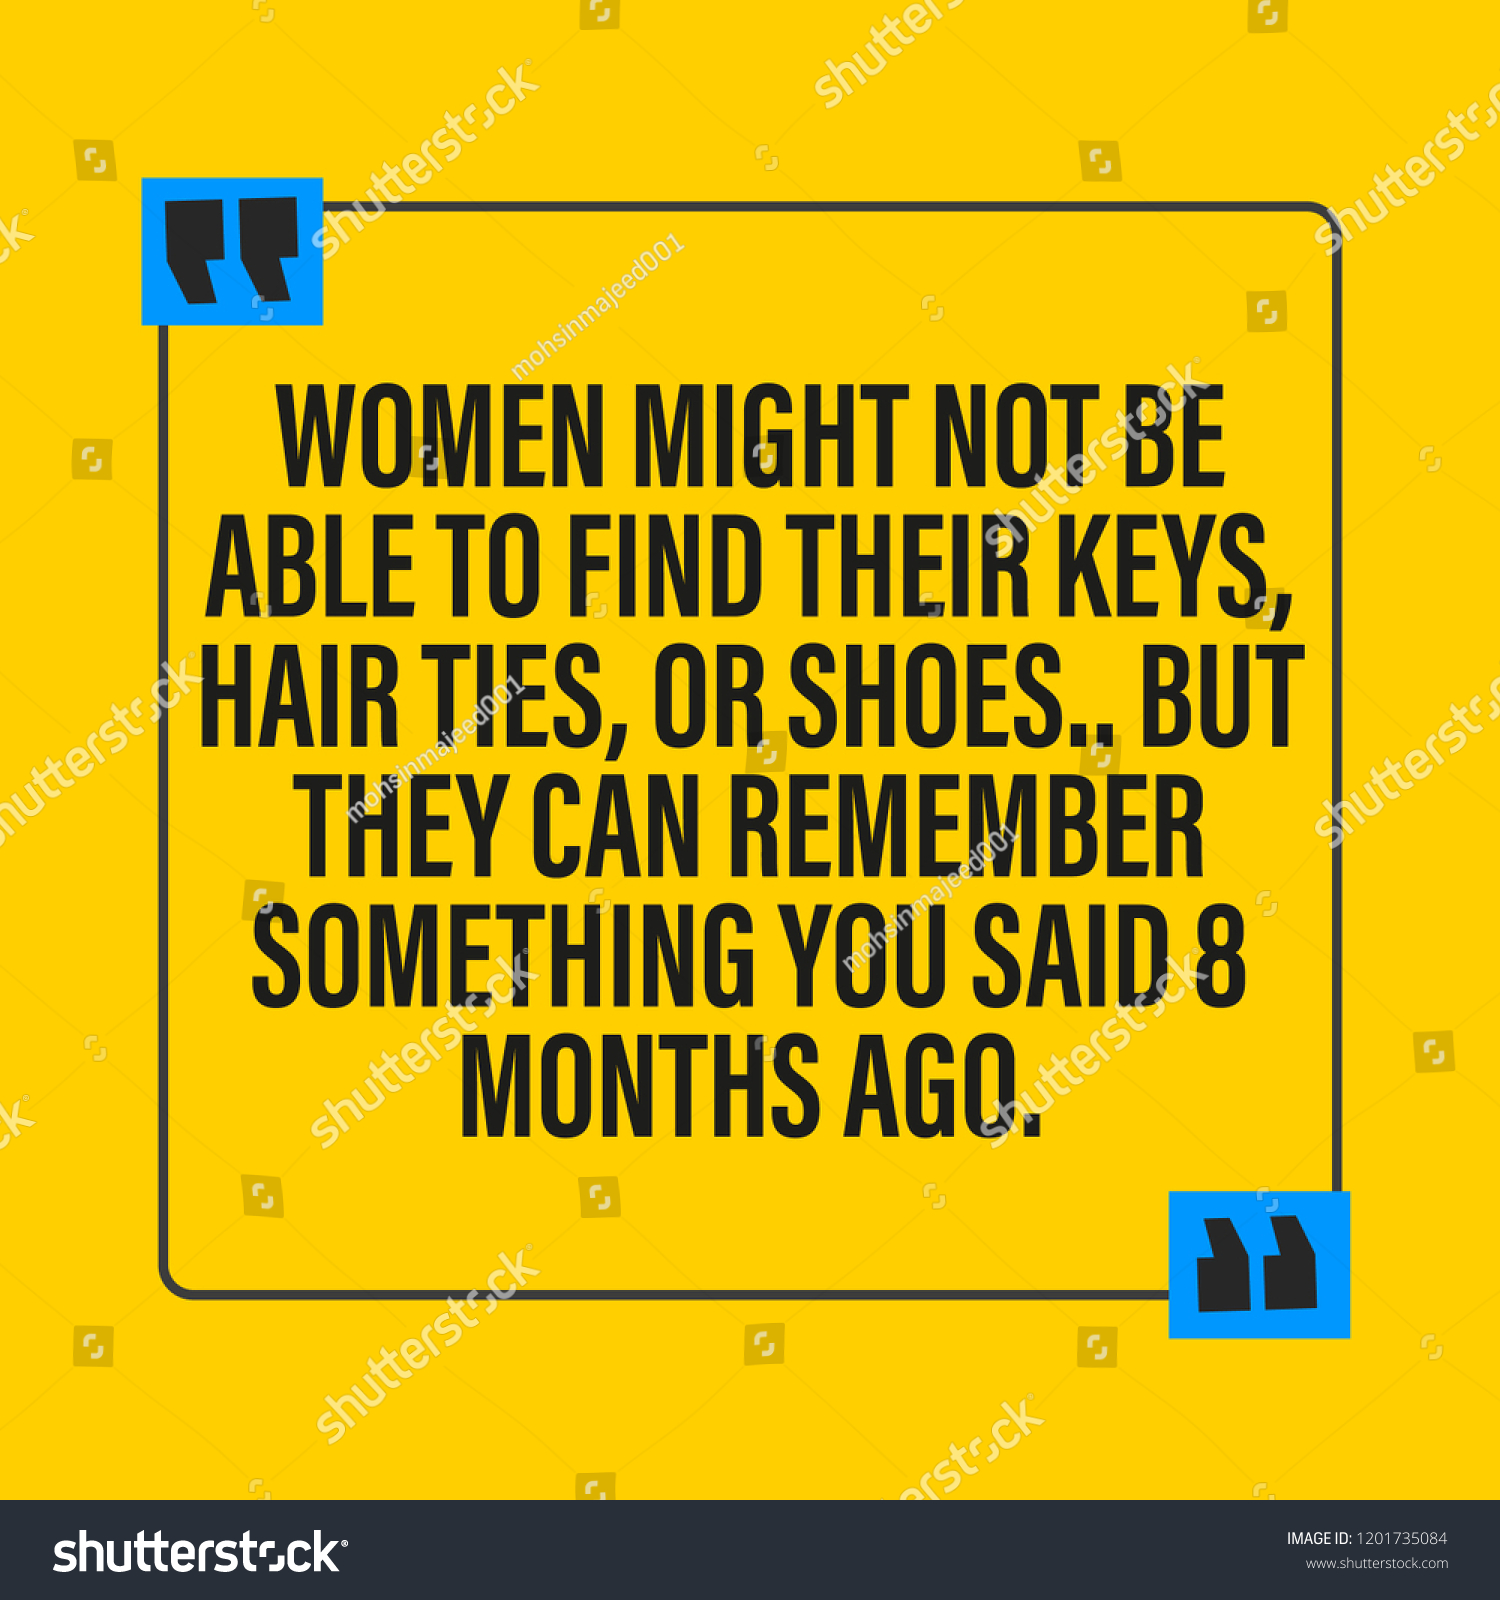 Funny Love Quotes That Will Make Stockvector Rechtenvrij